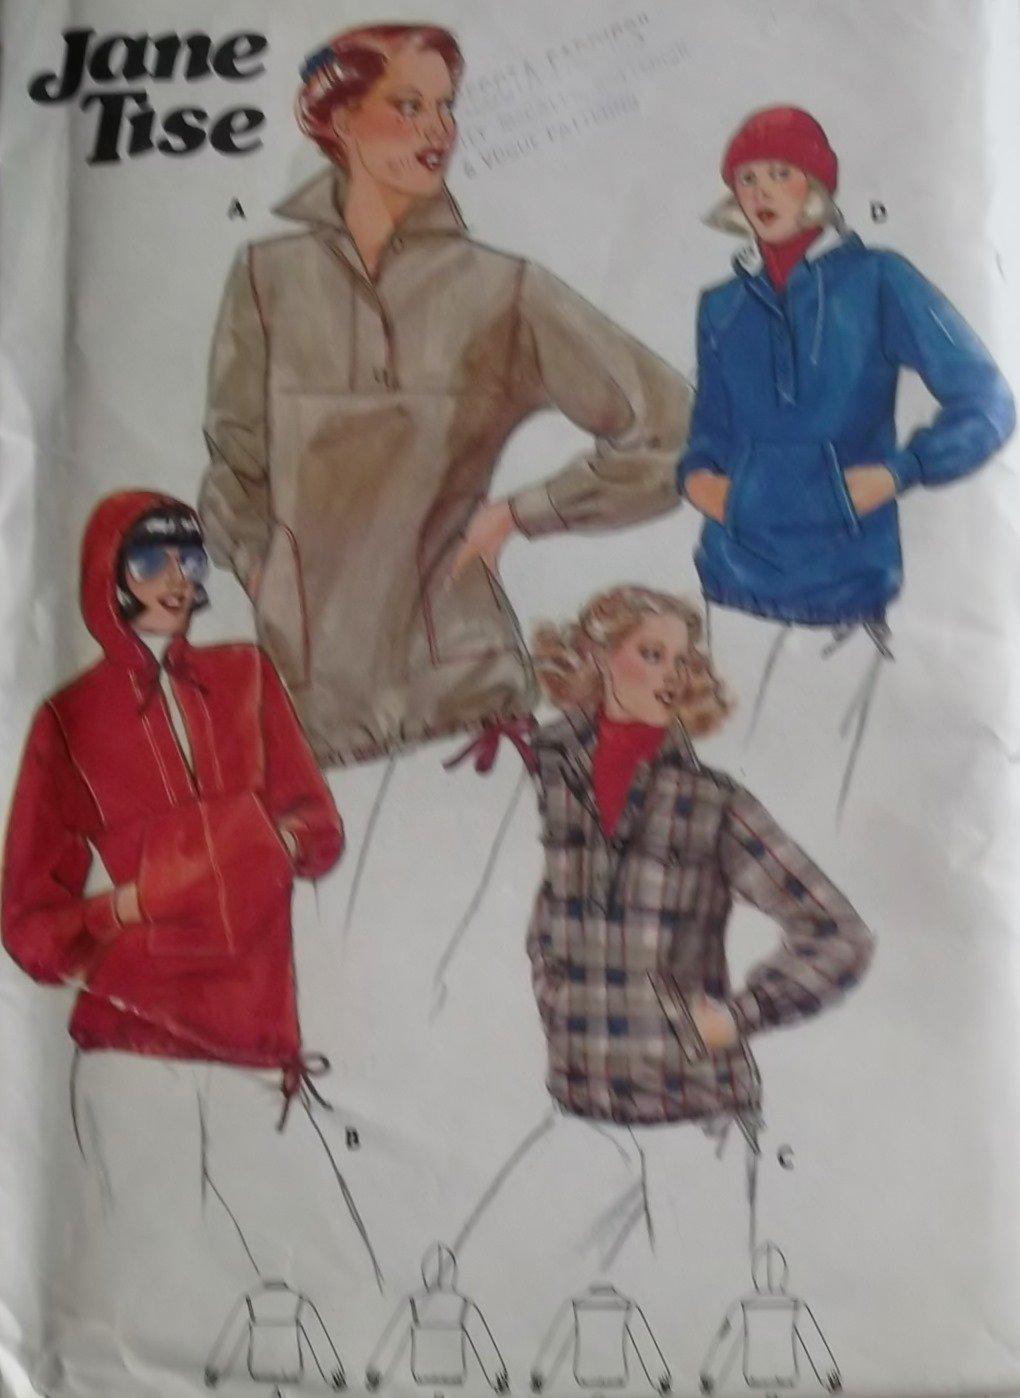 Vintage Butterick 5628 Misses' Top or Jacket Pattern, Size 8, Uncut